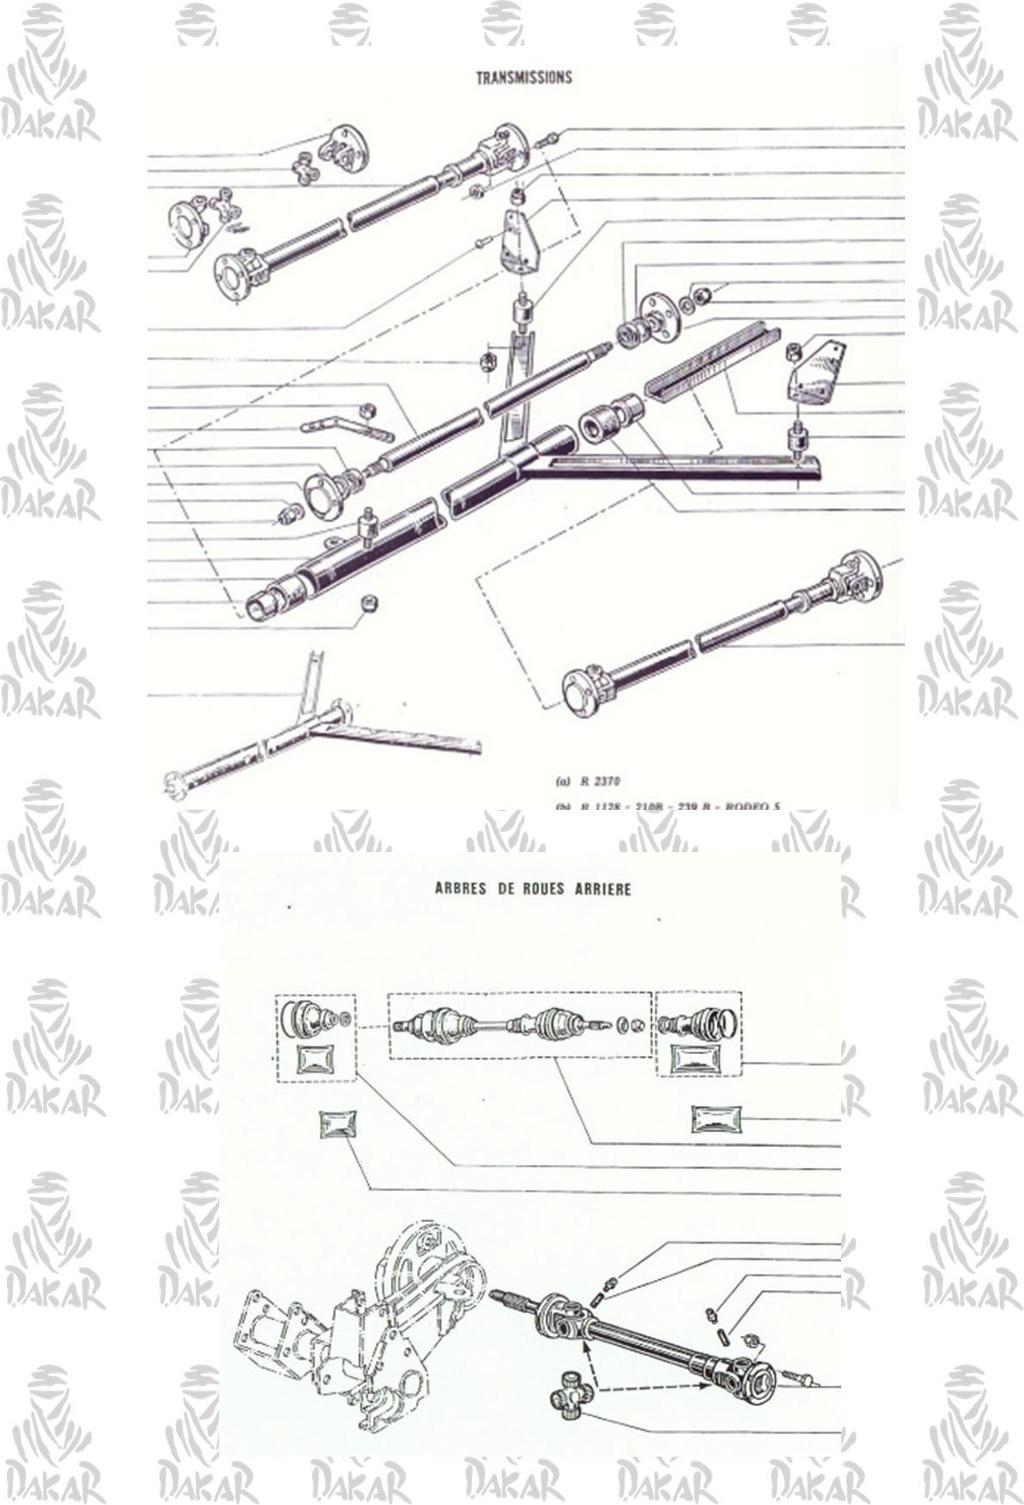 [1/24]Renault 4 l dakar 1980 Ref 80759 1811